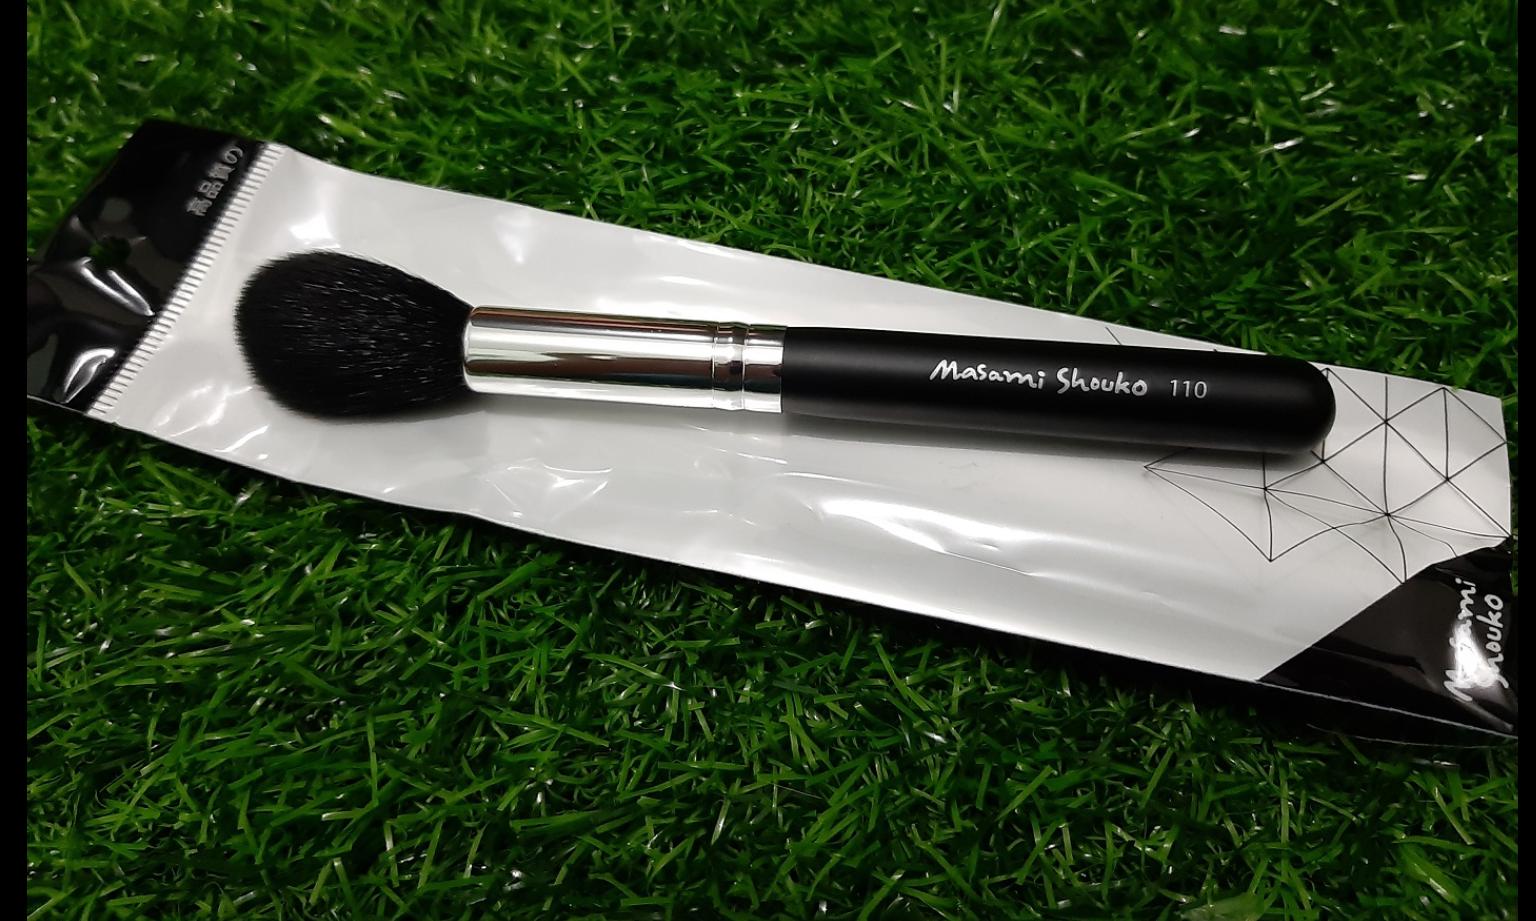 Masami Shouko 110 S Tapered Blending Brush